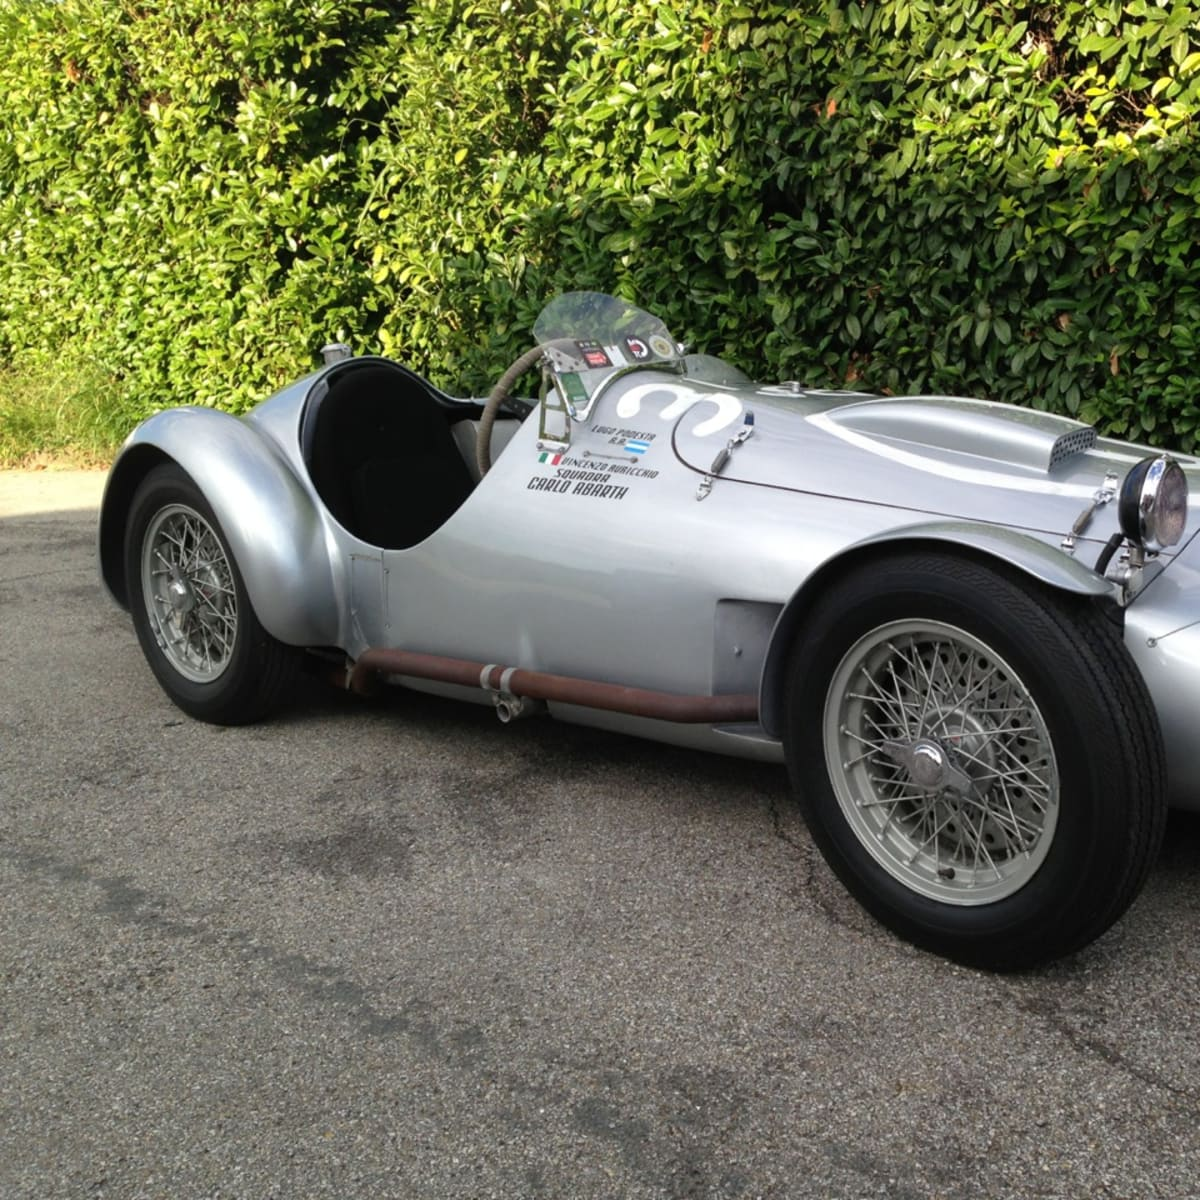 vintage sports racing car Tazio Nuvolari's 1950 Race Cistalia Abarth 204a